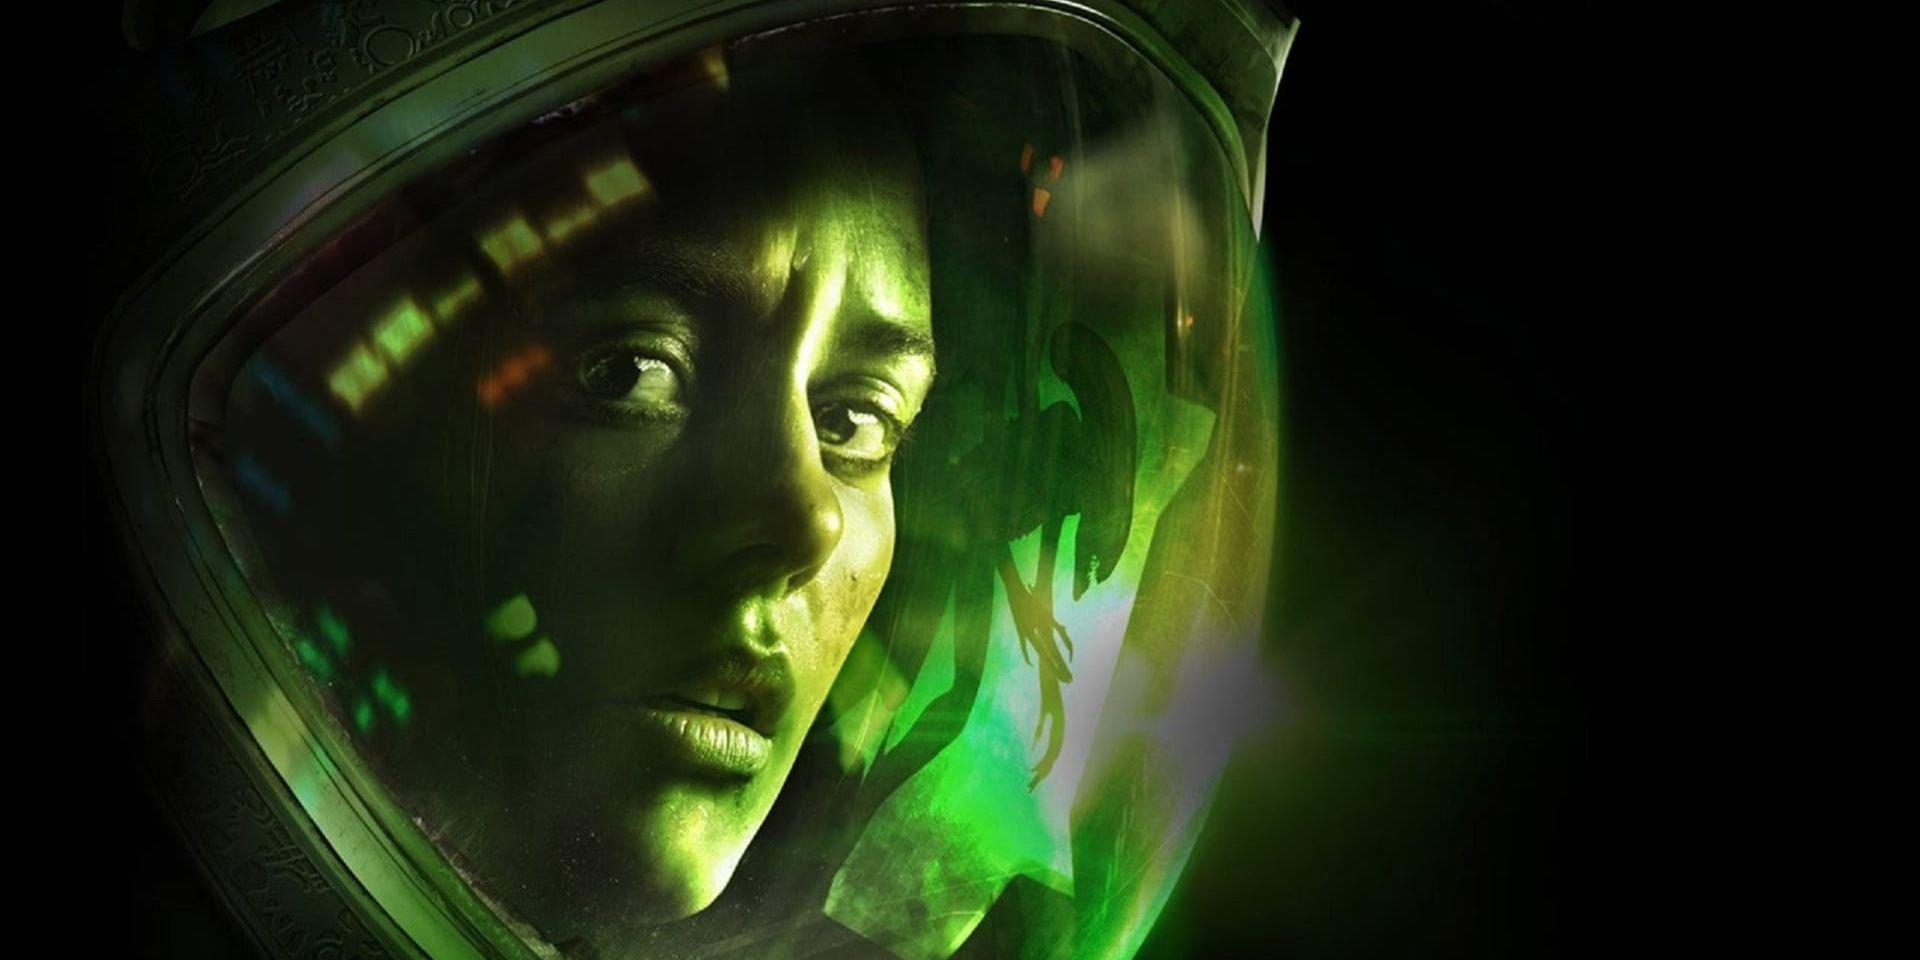 Årets spel 2014 – Alien Isolation – gratis nu på Epic store